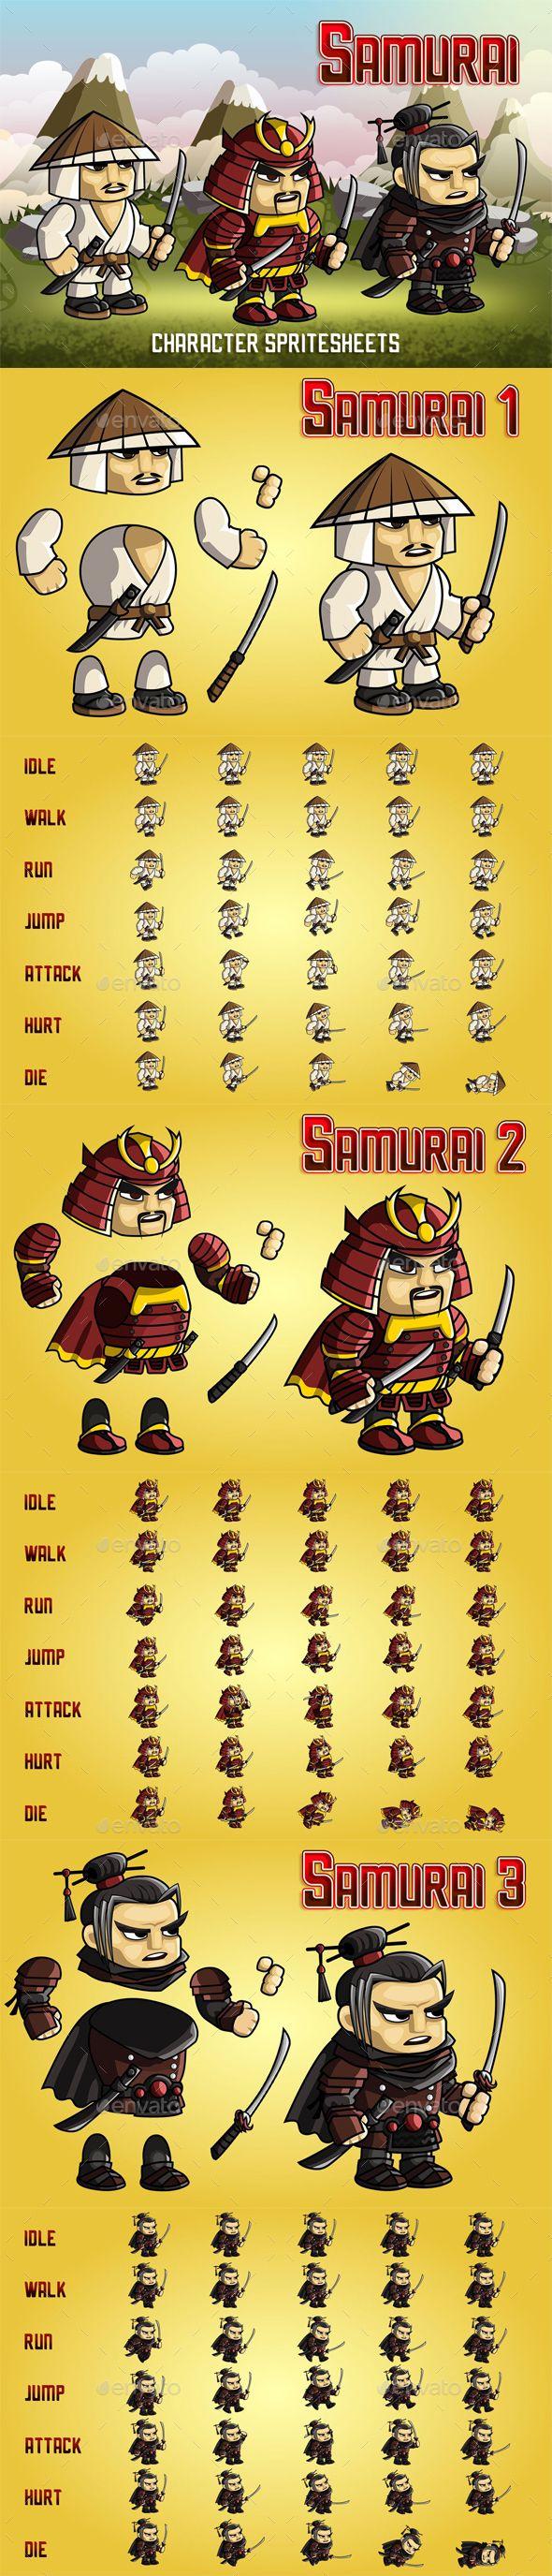 Samurai 2D Game Character Sprite Sheet - Sprites Game Assets